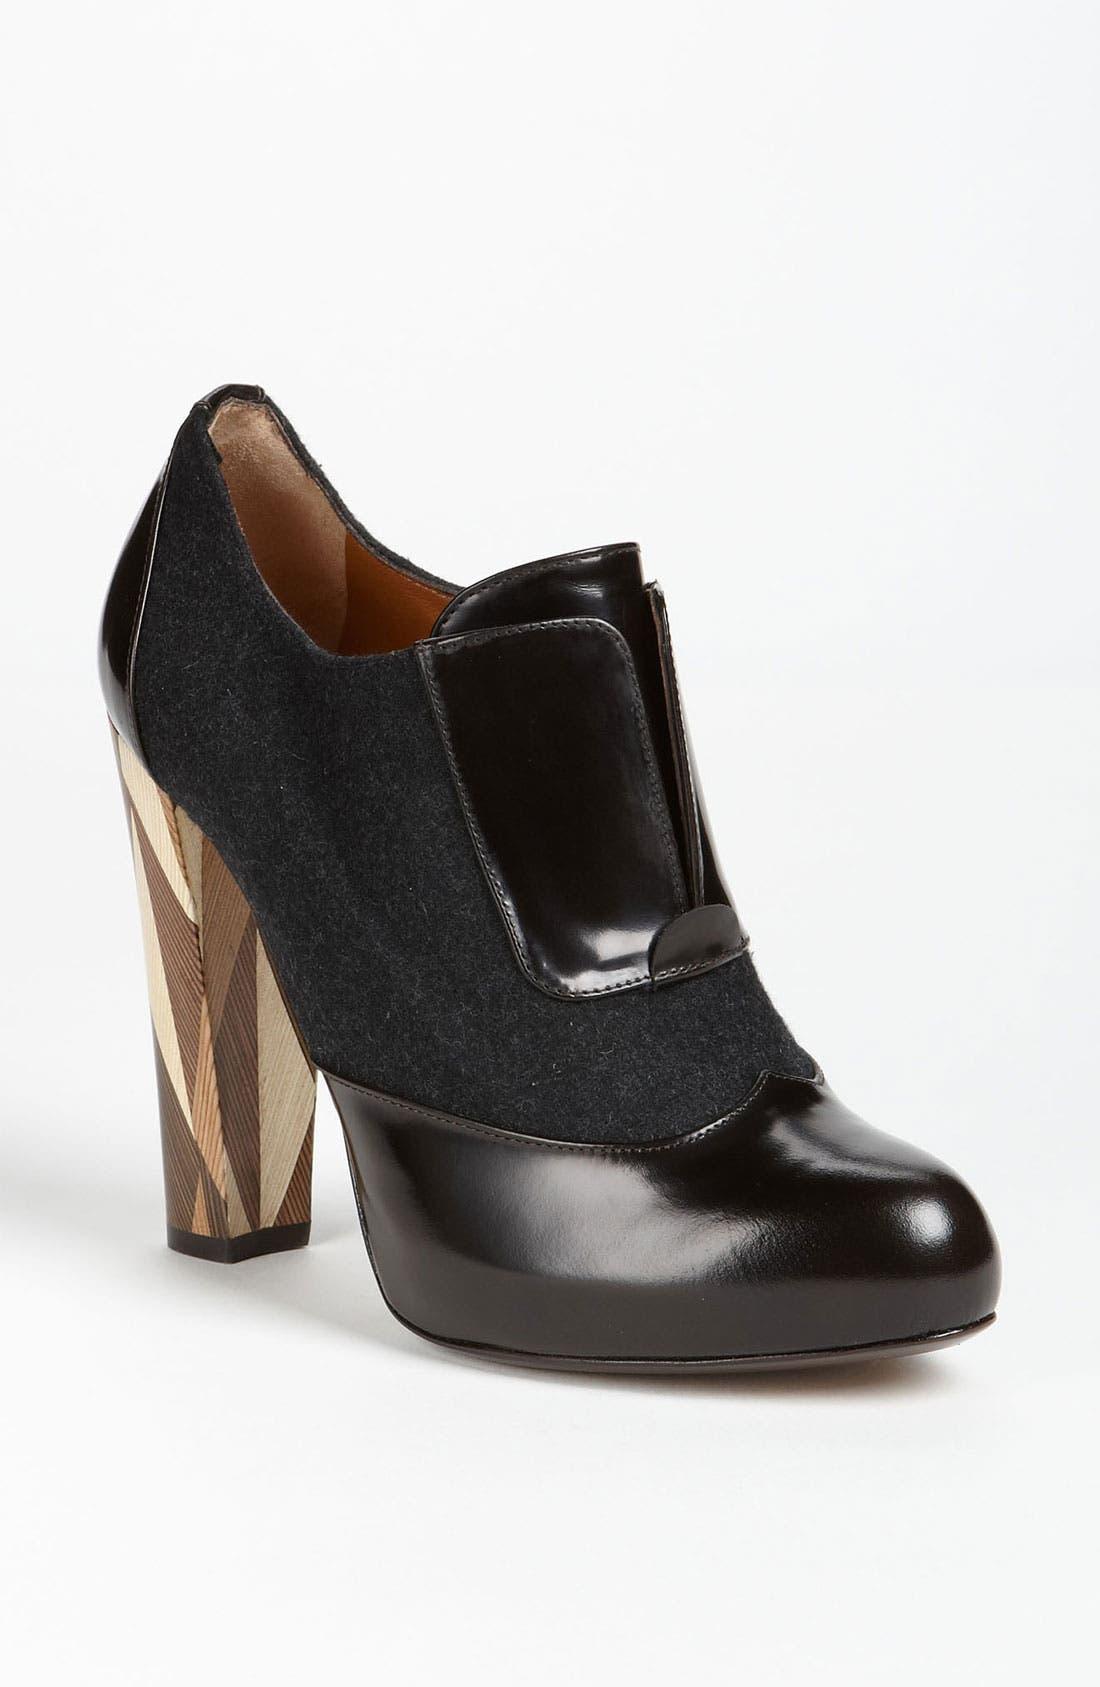 Main Image - Fendi 'Wuthering Heights' Wood Heel Bootie